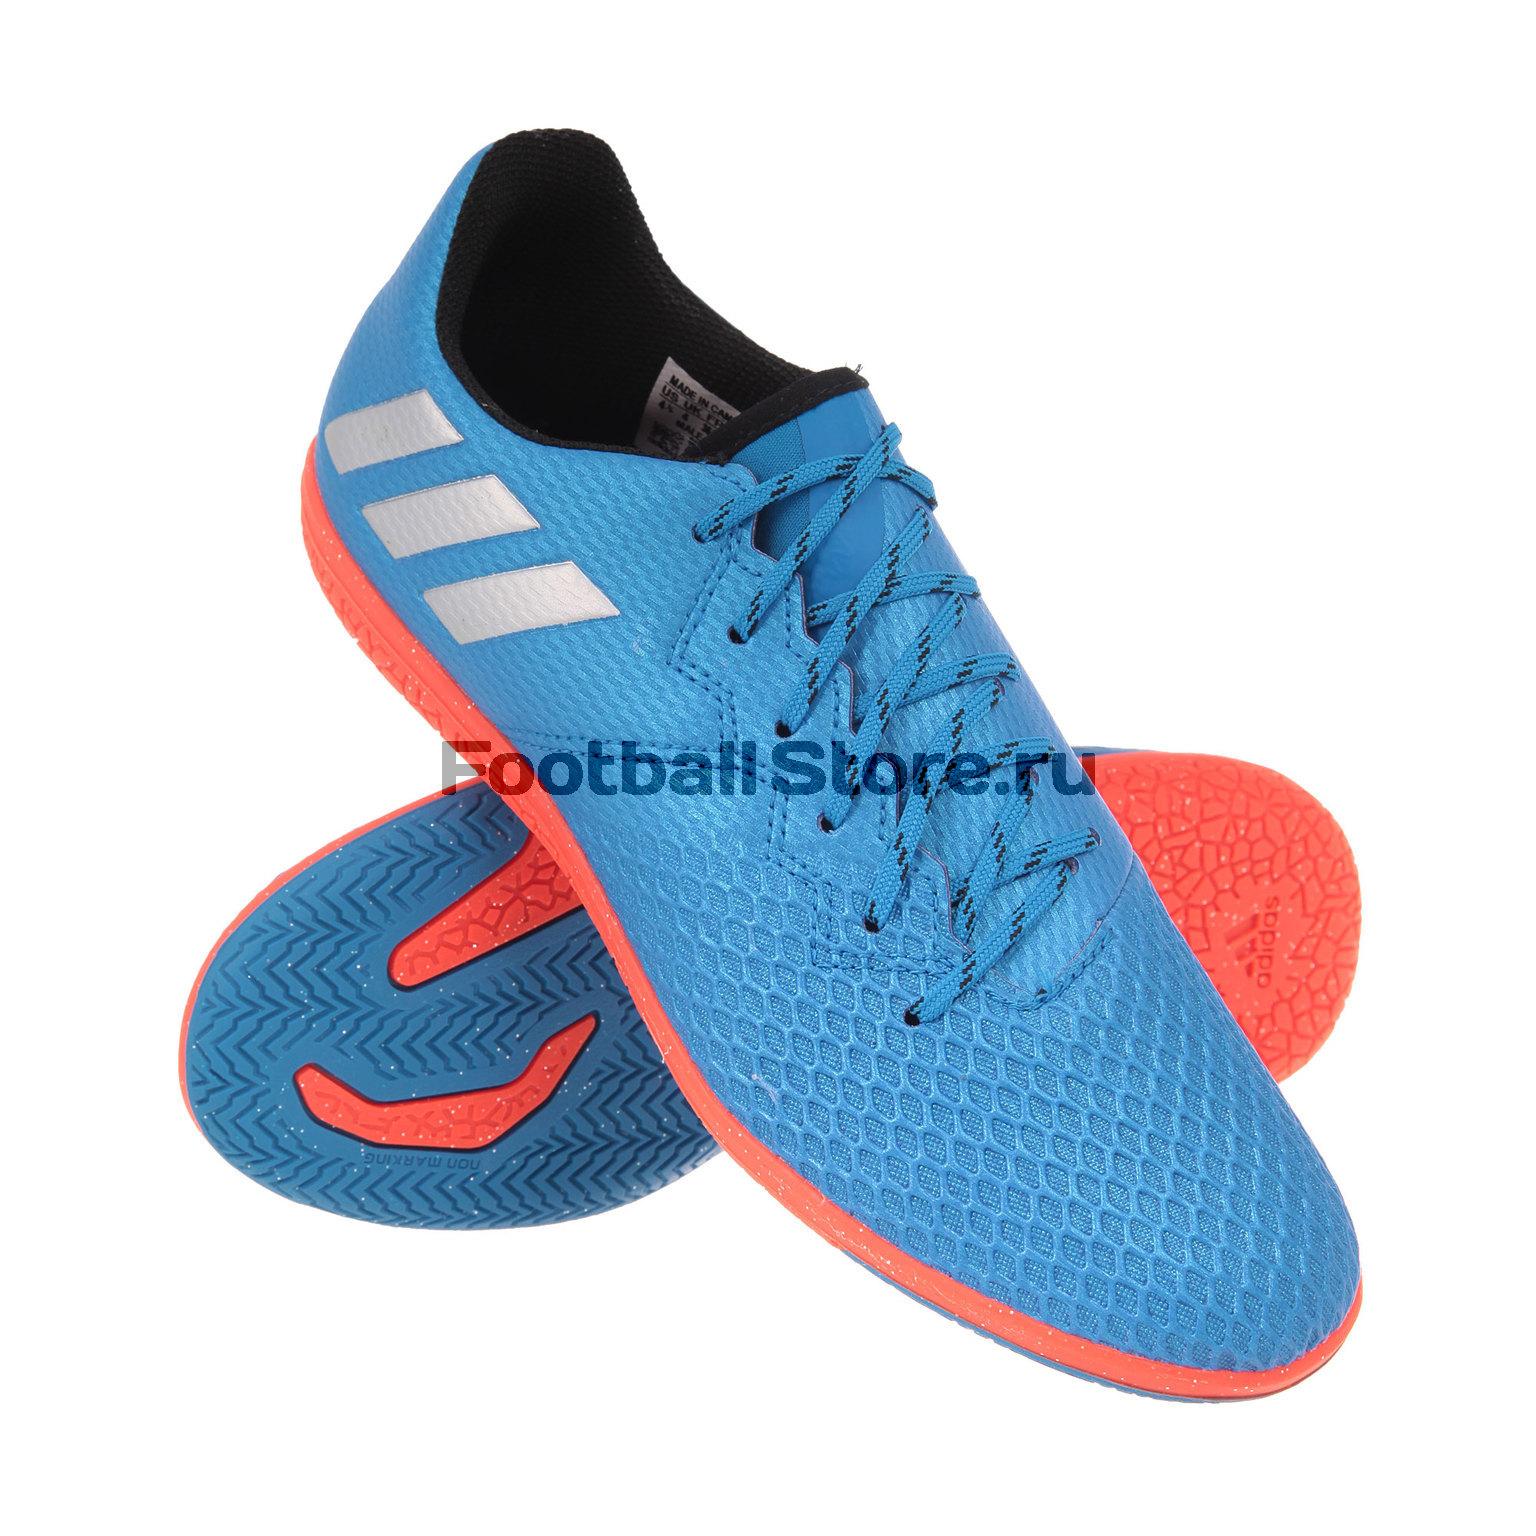 ФОТО adidas Обувь для зала adidas messi 16.3 in jr s79640